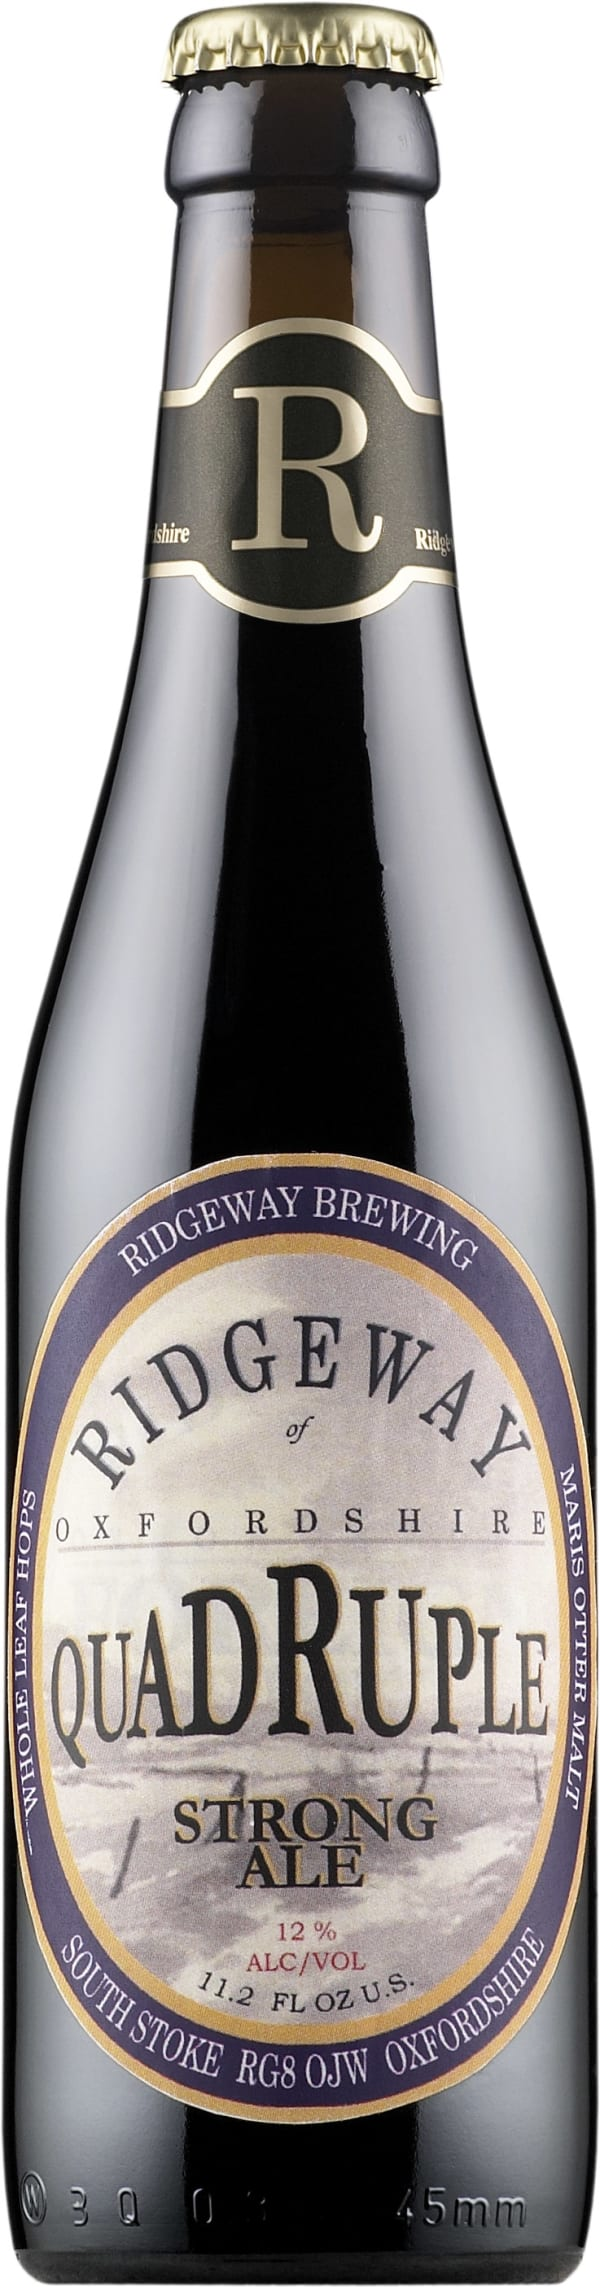 Ridgeway Quadruple Strong Ale